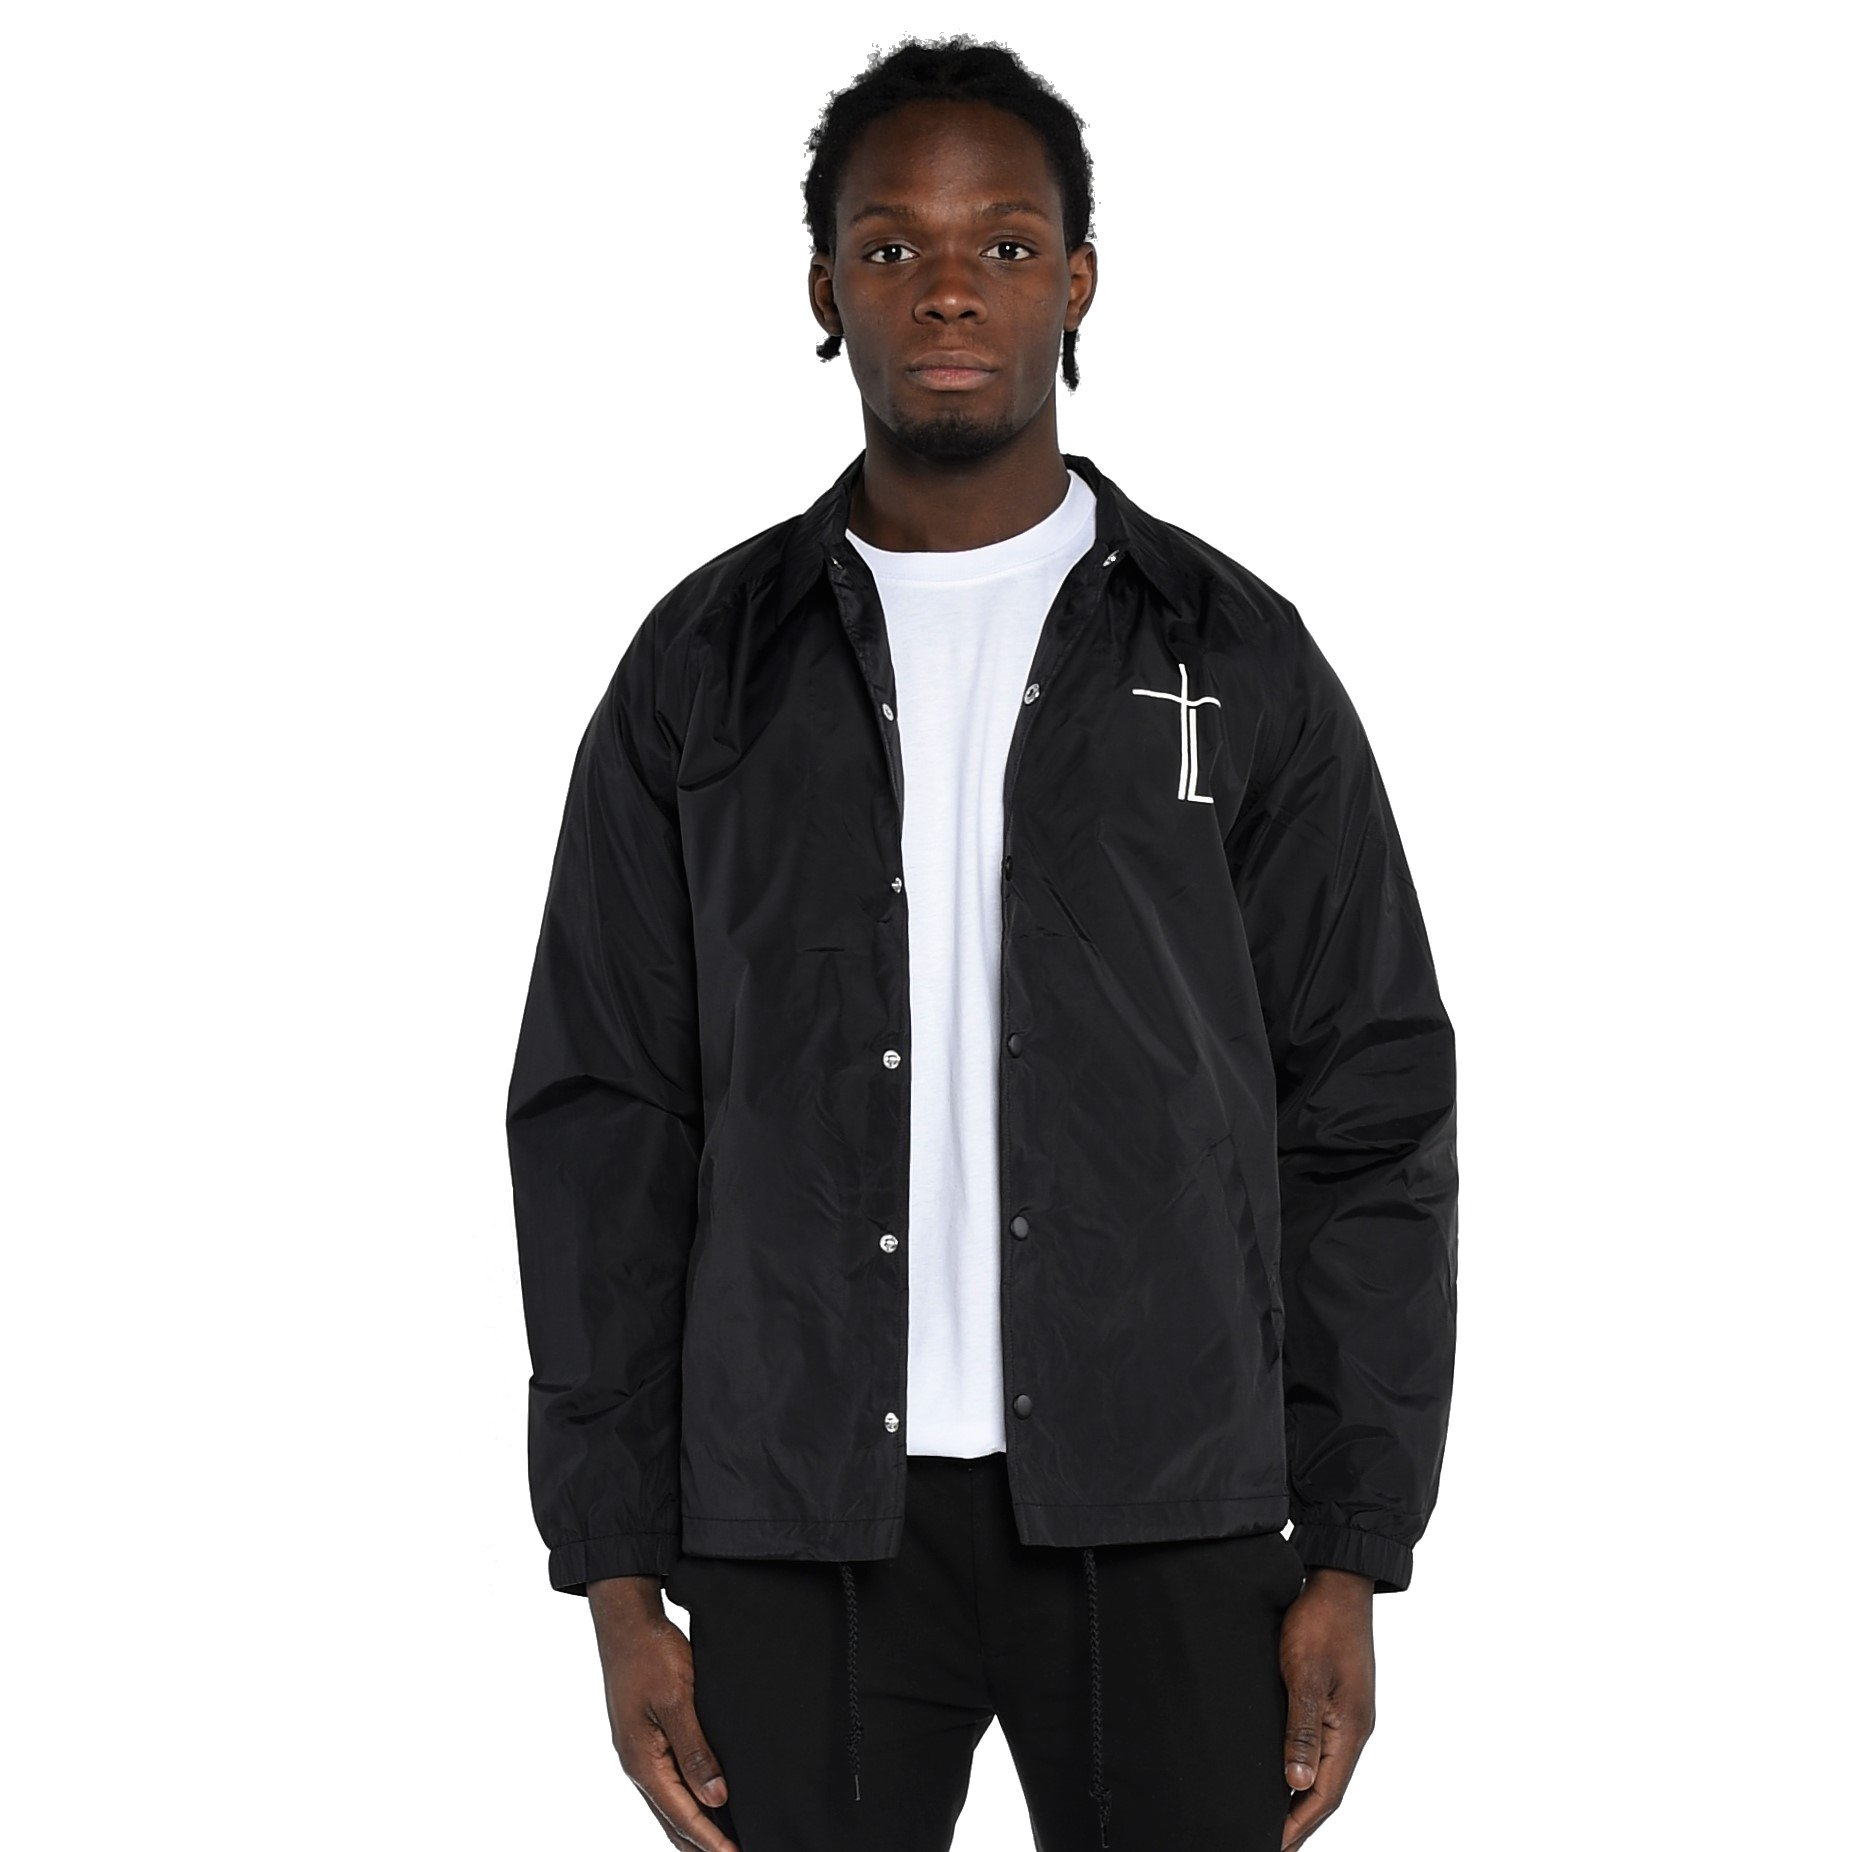 Men's Woven Coach Jacket - Core Logo by Traplord